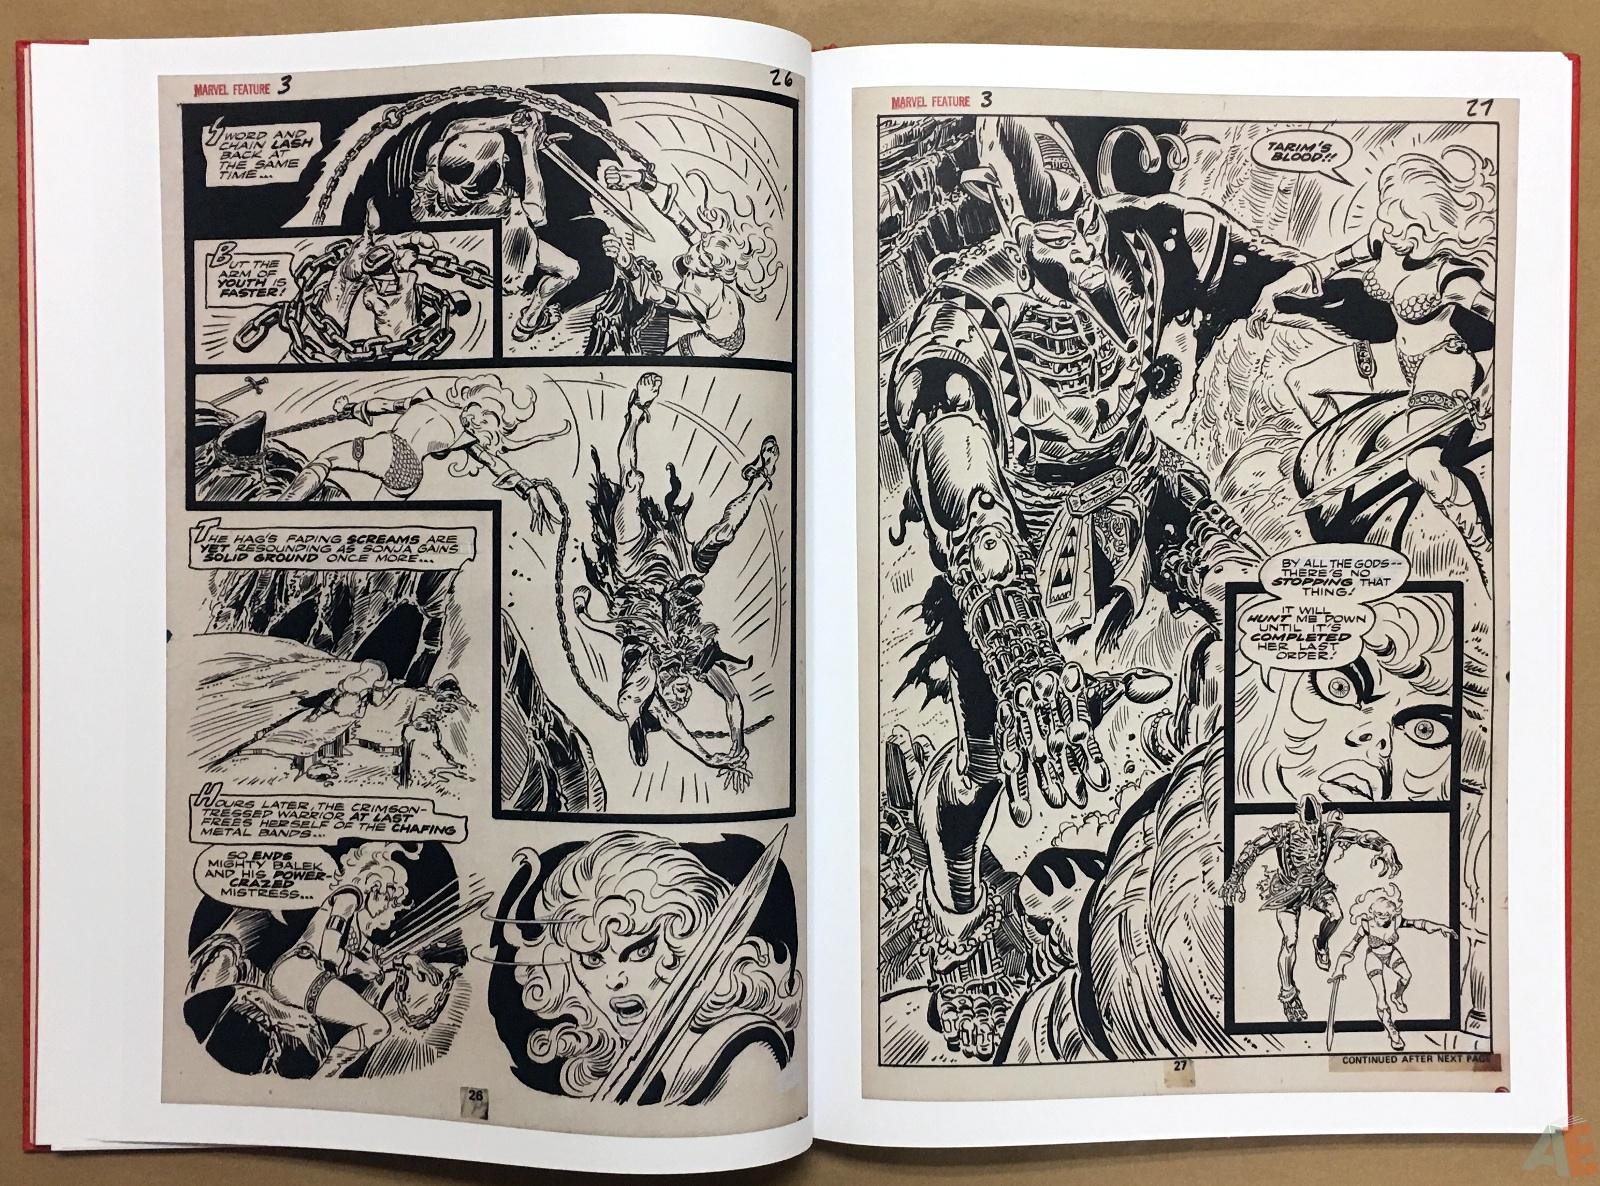 Frank Thorne's Red Sonja Art Edition Volume 1